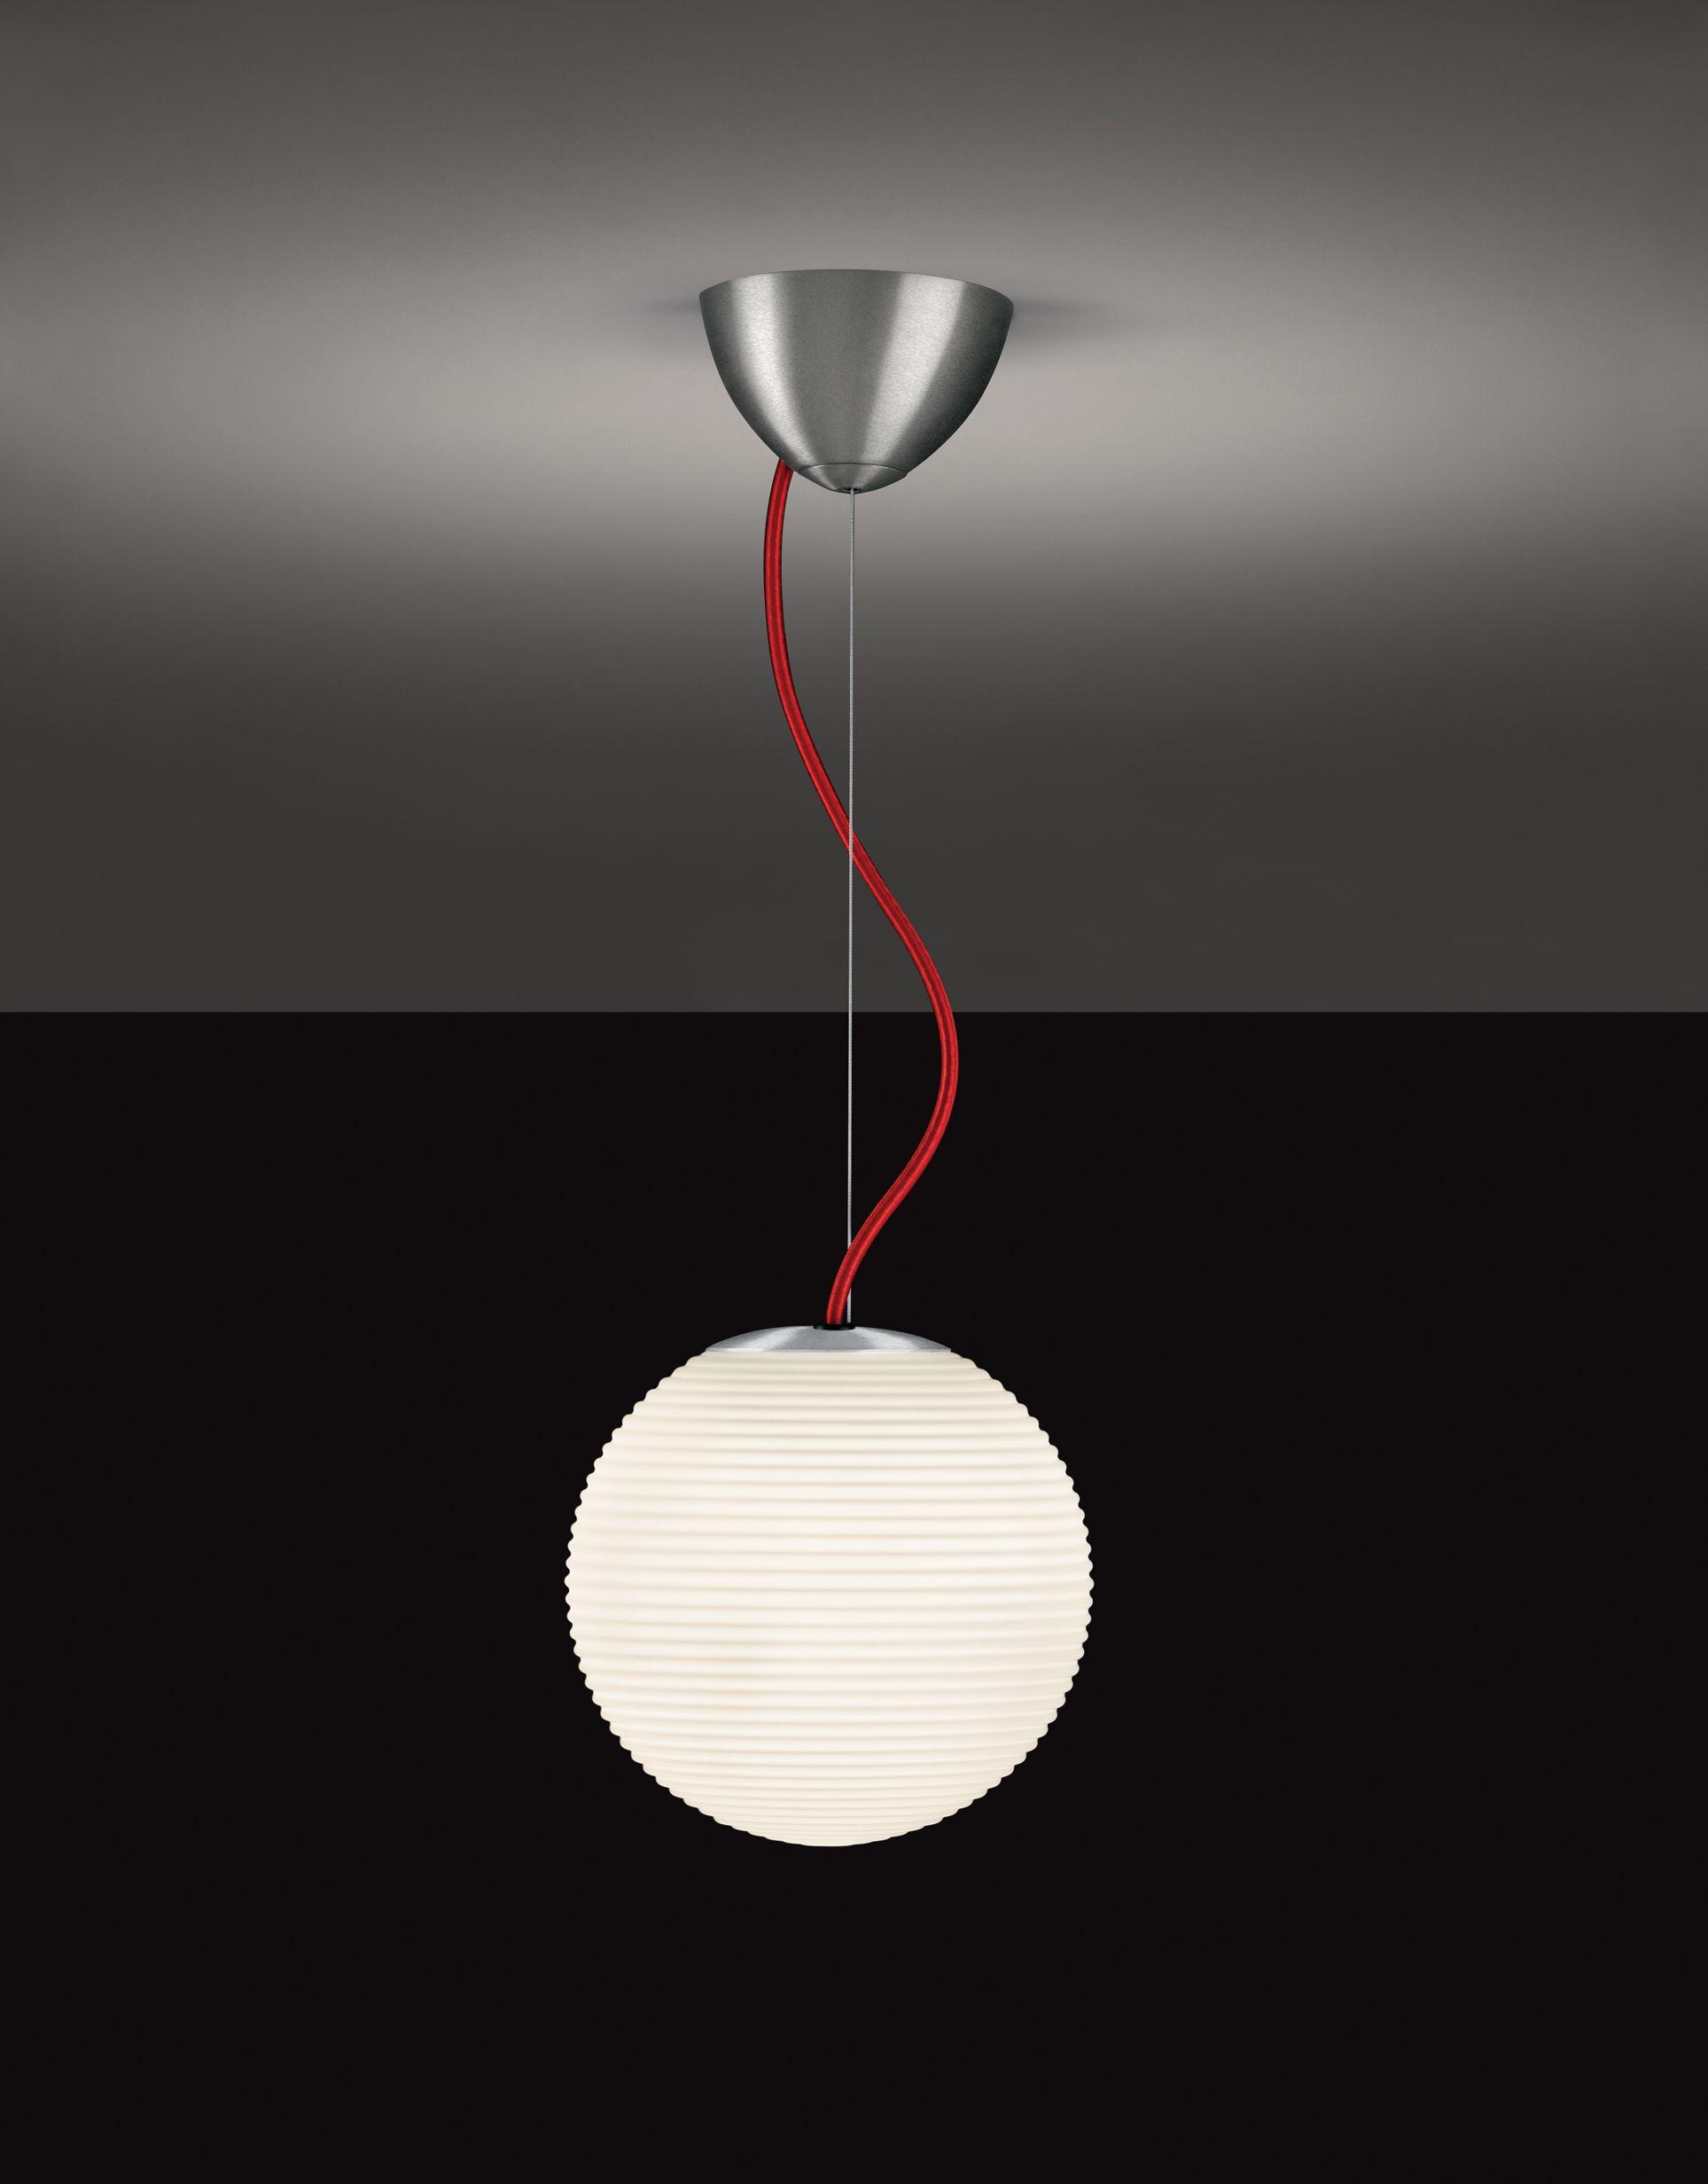 ball pendant lighting. OCL Lighting, Ribbed Glass Ball Pendant Lighting E